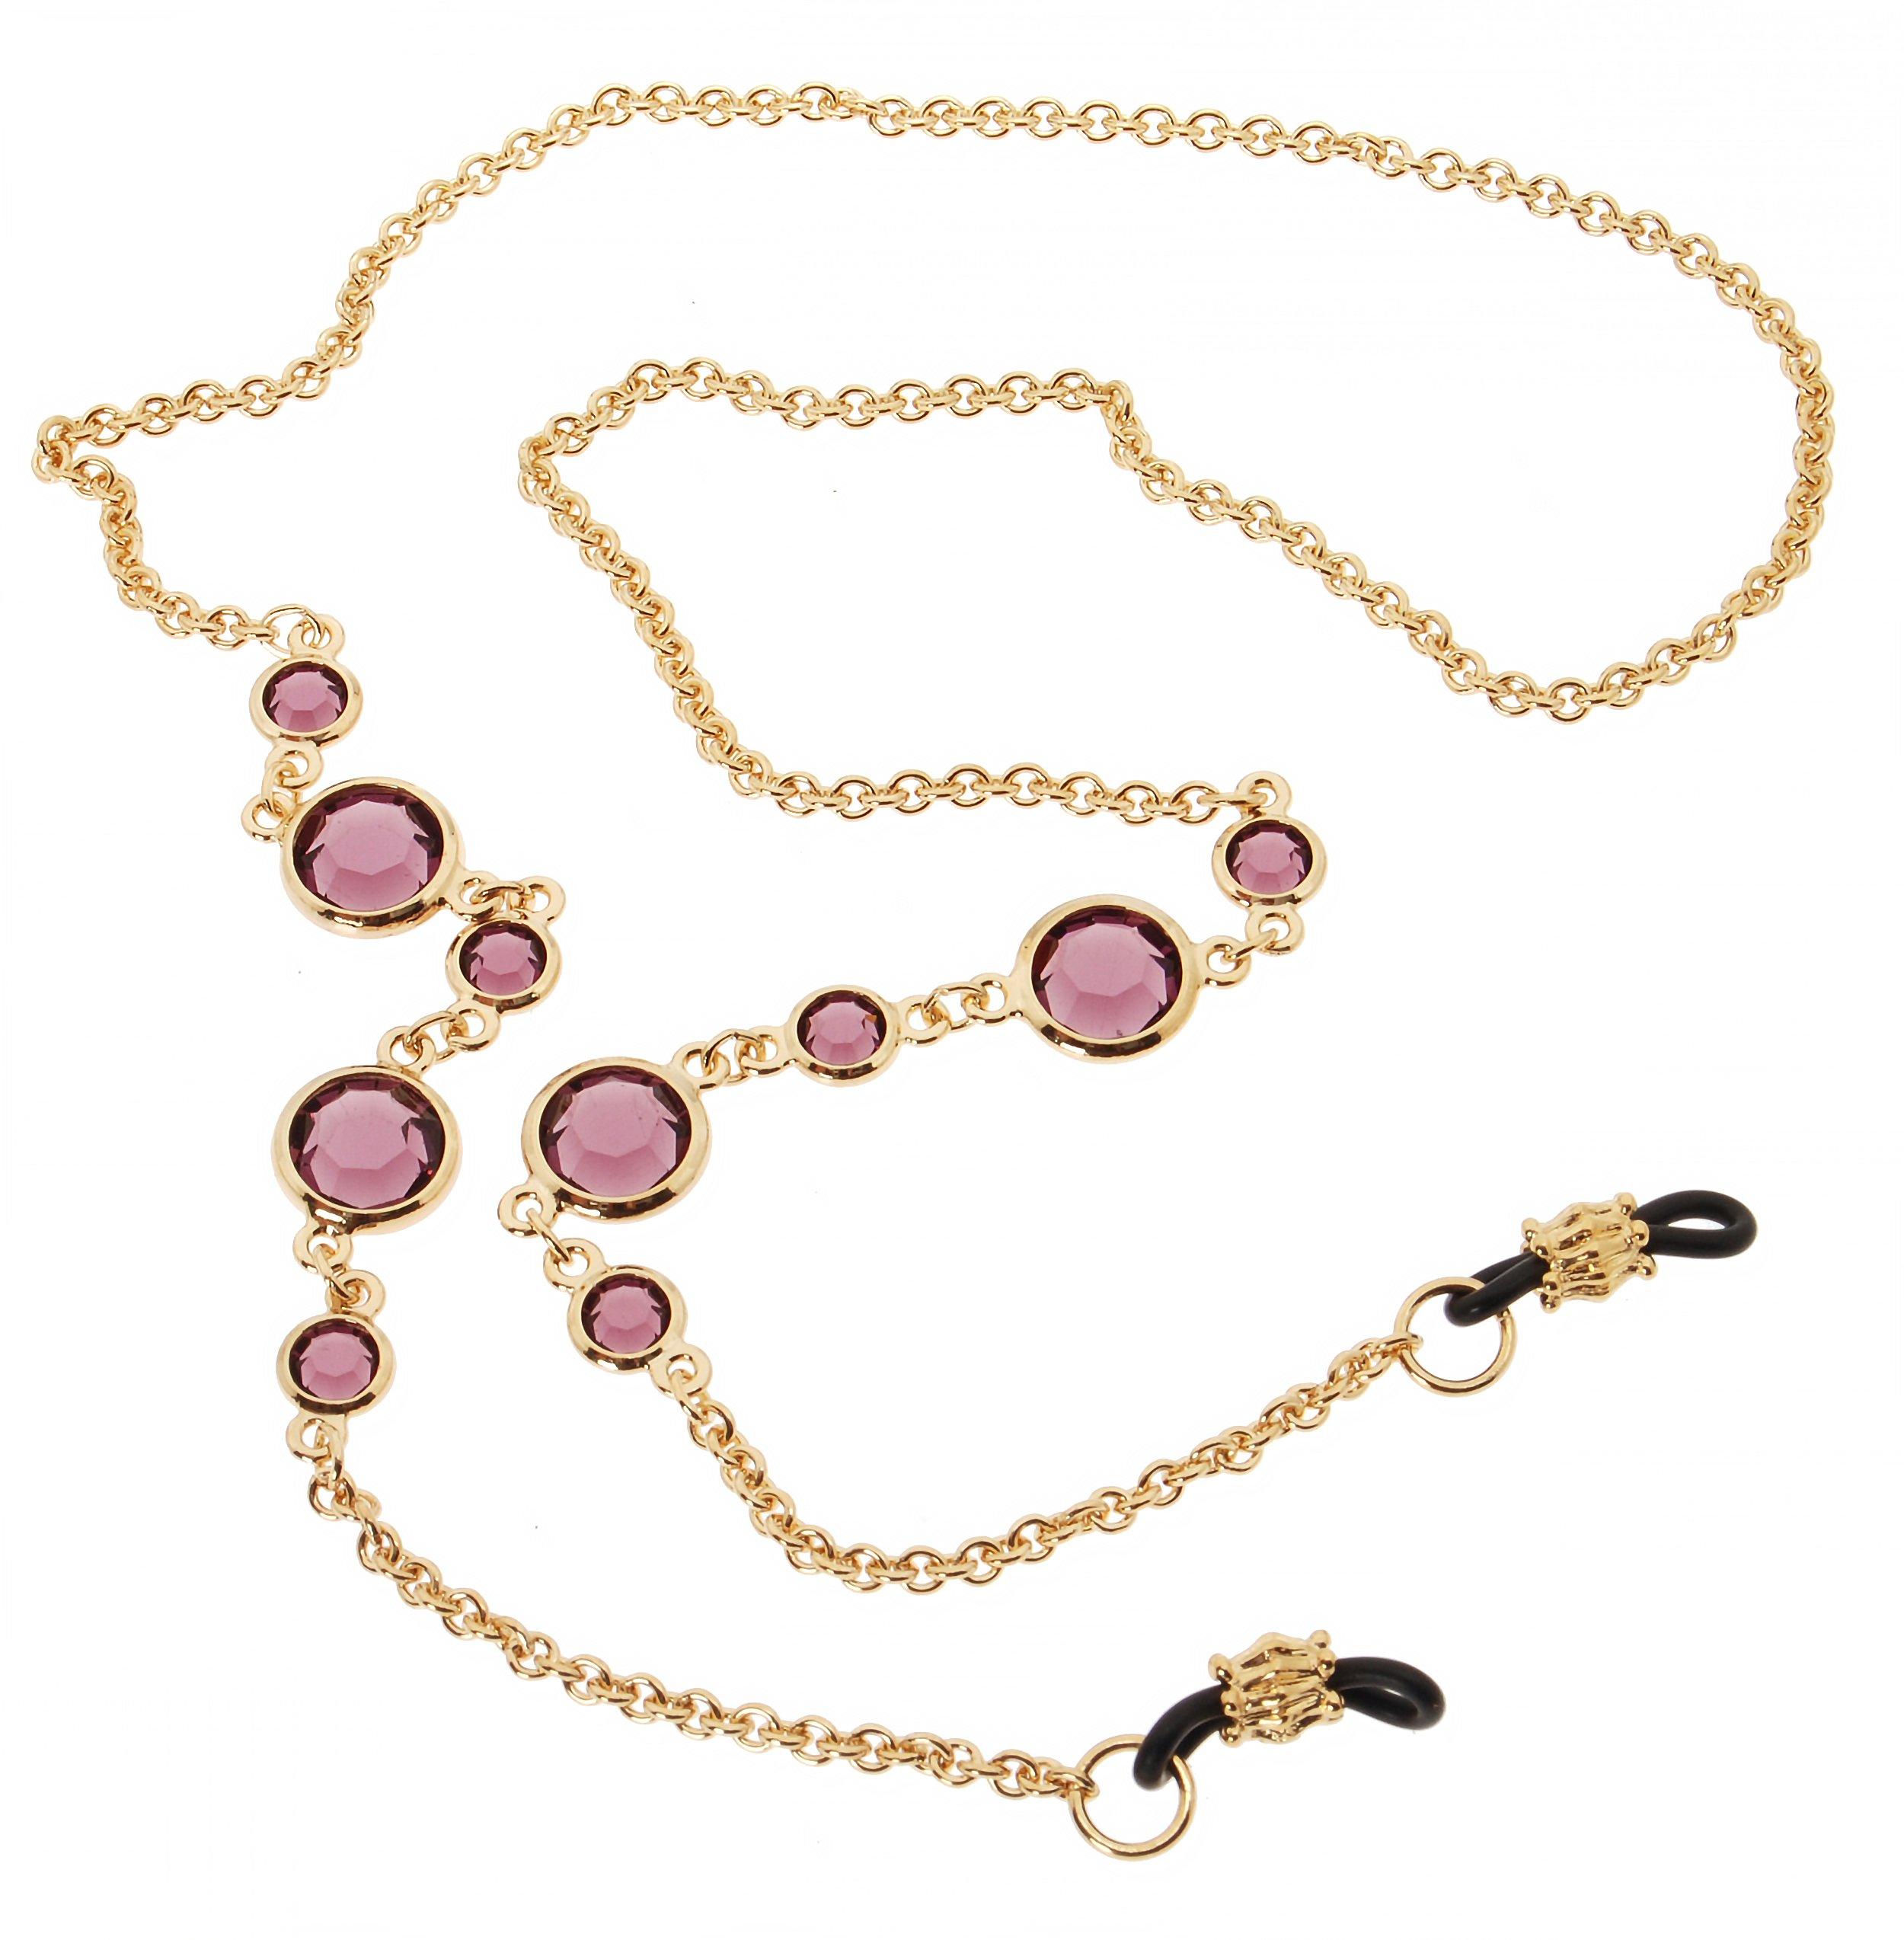 L. Erickson Daphanie Eyeglass Chain - Amethyst/Gold by L. Erickson